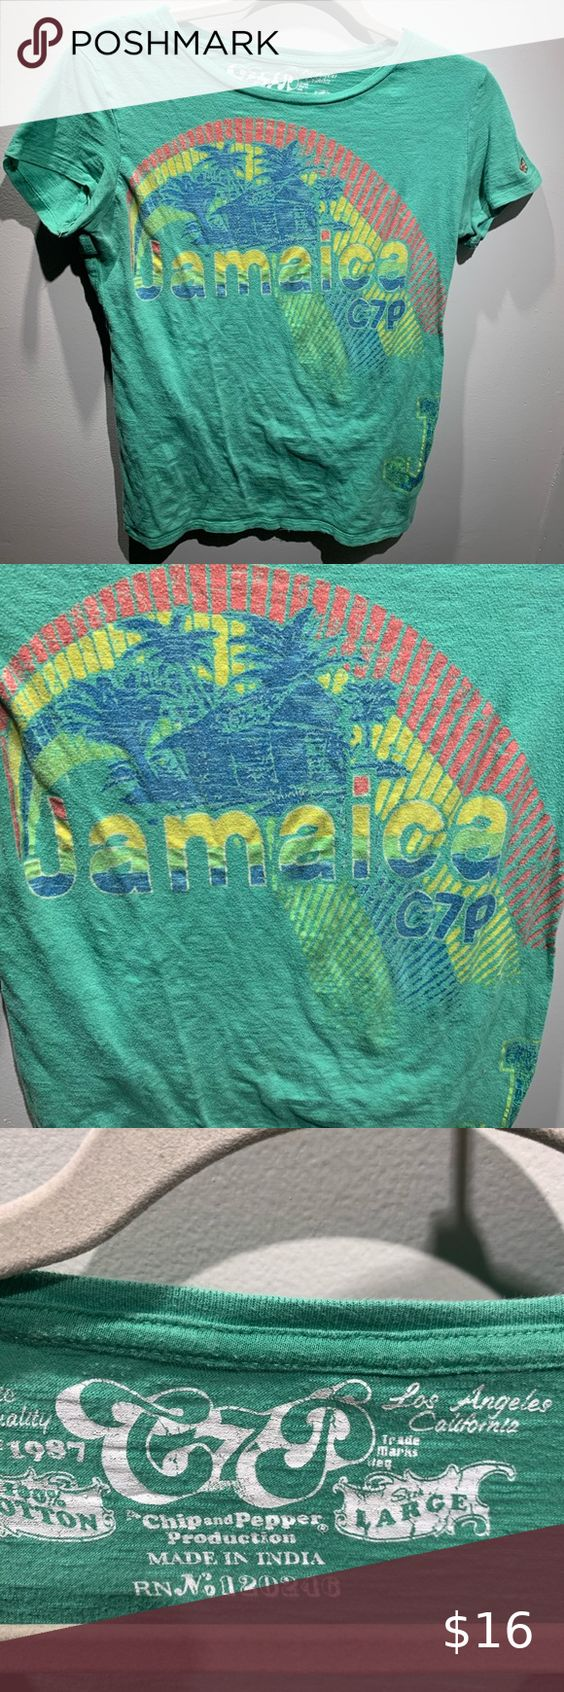 Jamaica C7p Vintage Style Shirt Large Shirt Style Vintage Fashion Tea Shirt